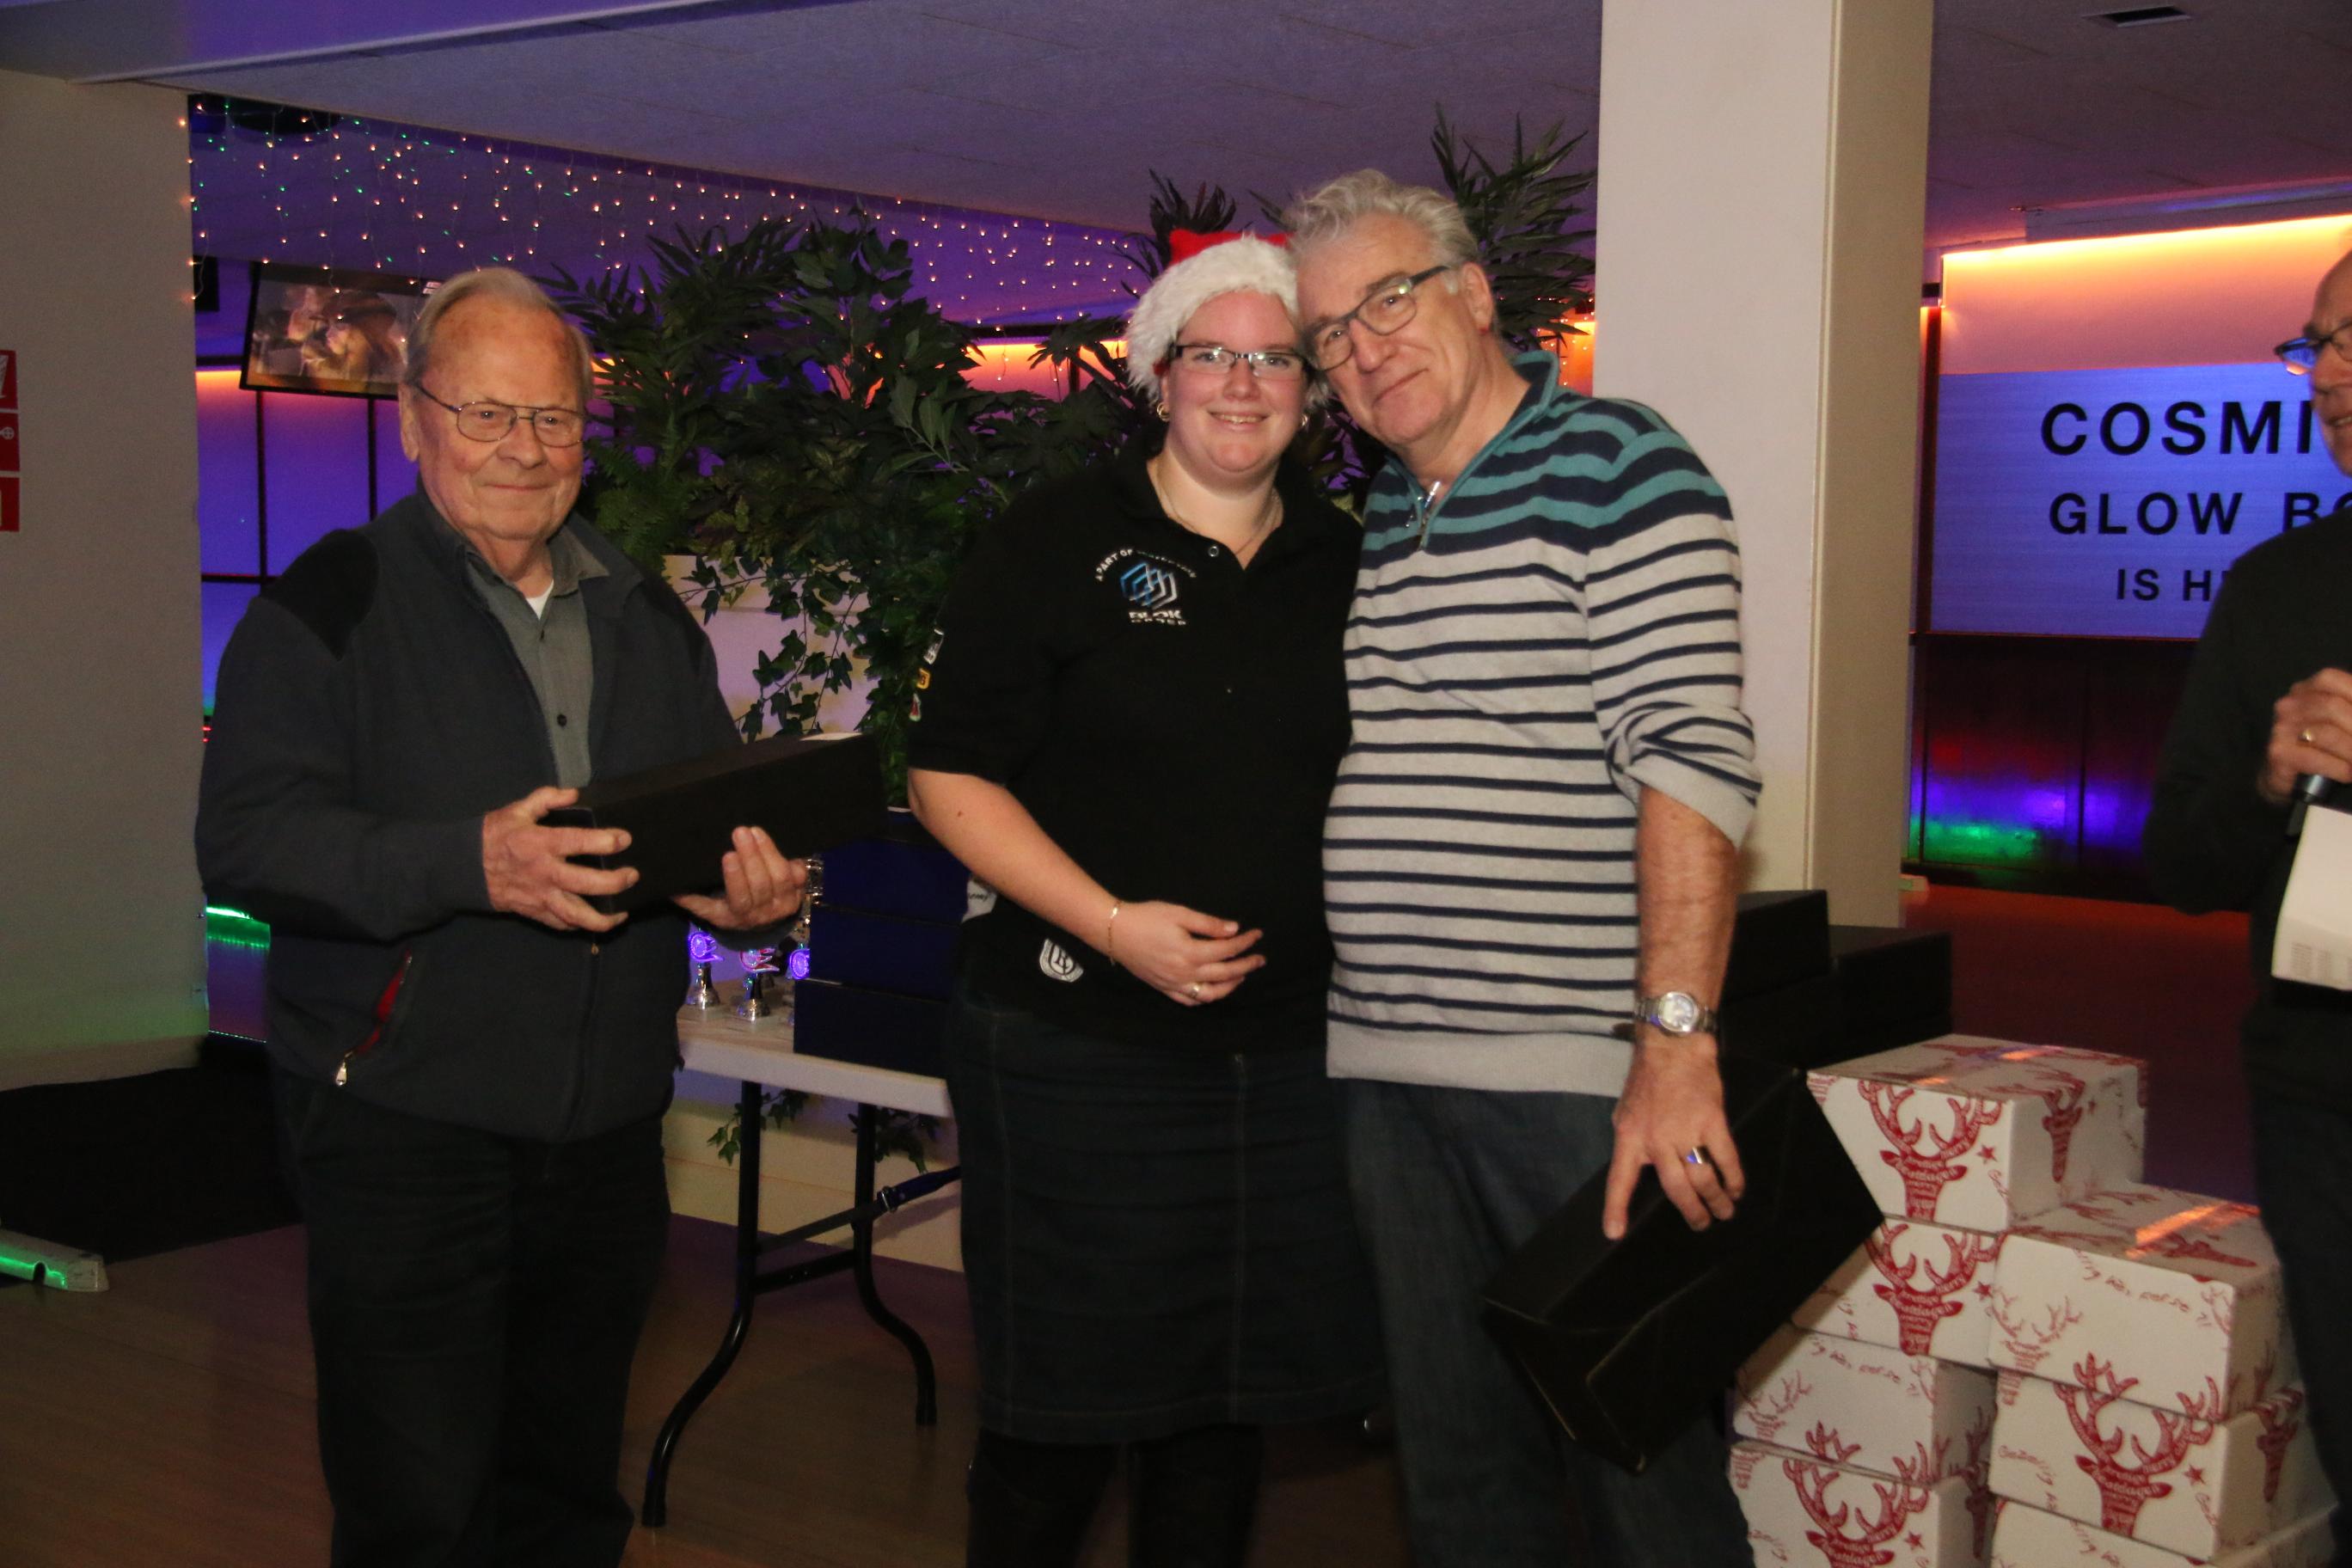 http://www.bowlingverenigingheiloo.nl/fotos_verhalen/foto's/2016_1222-Kerst-Patricia-Jan.jpg